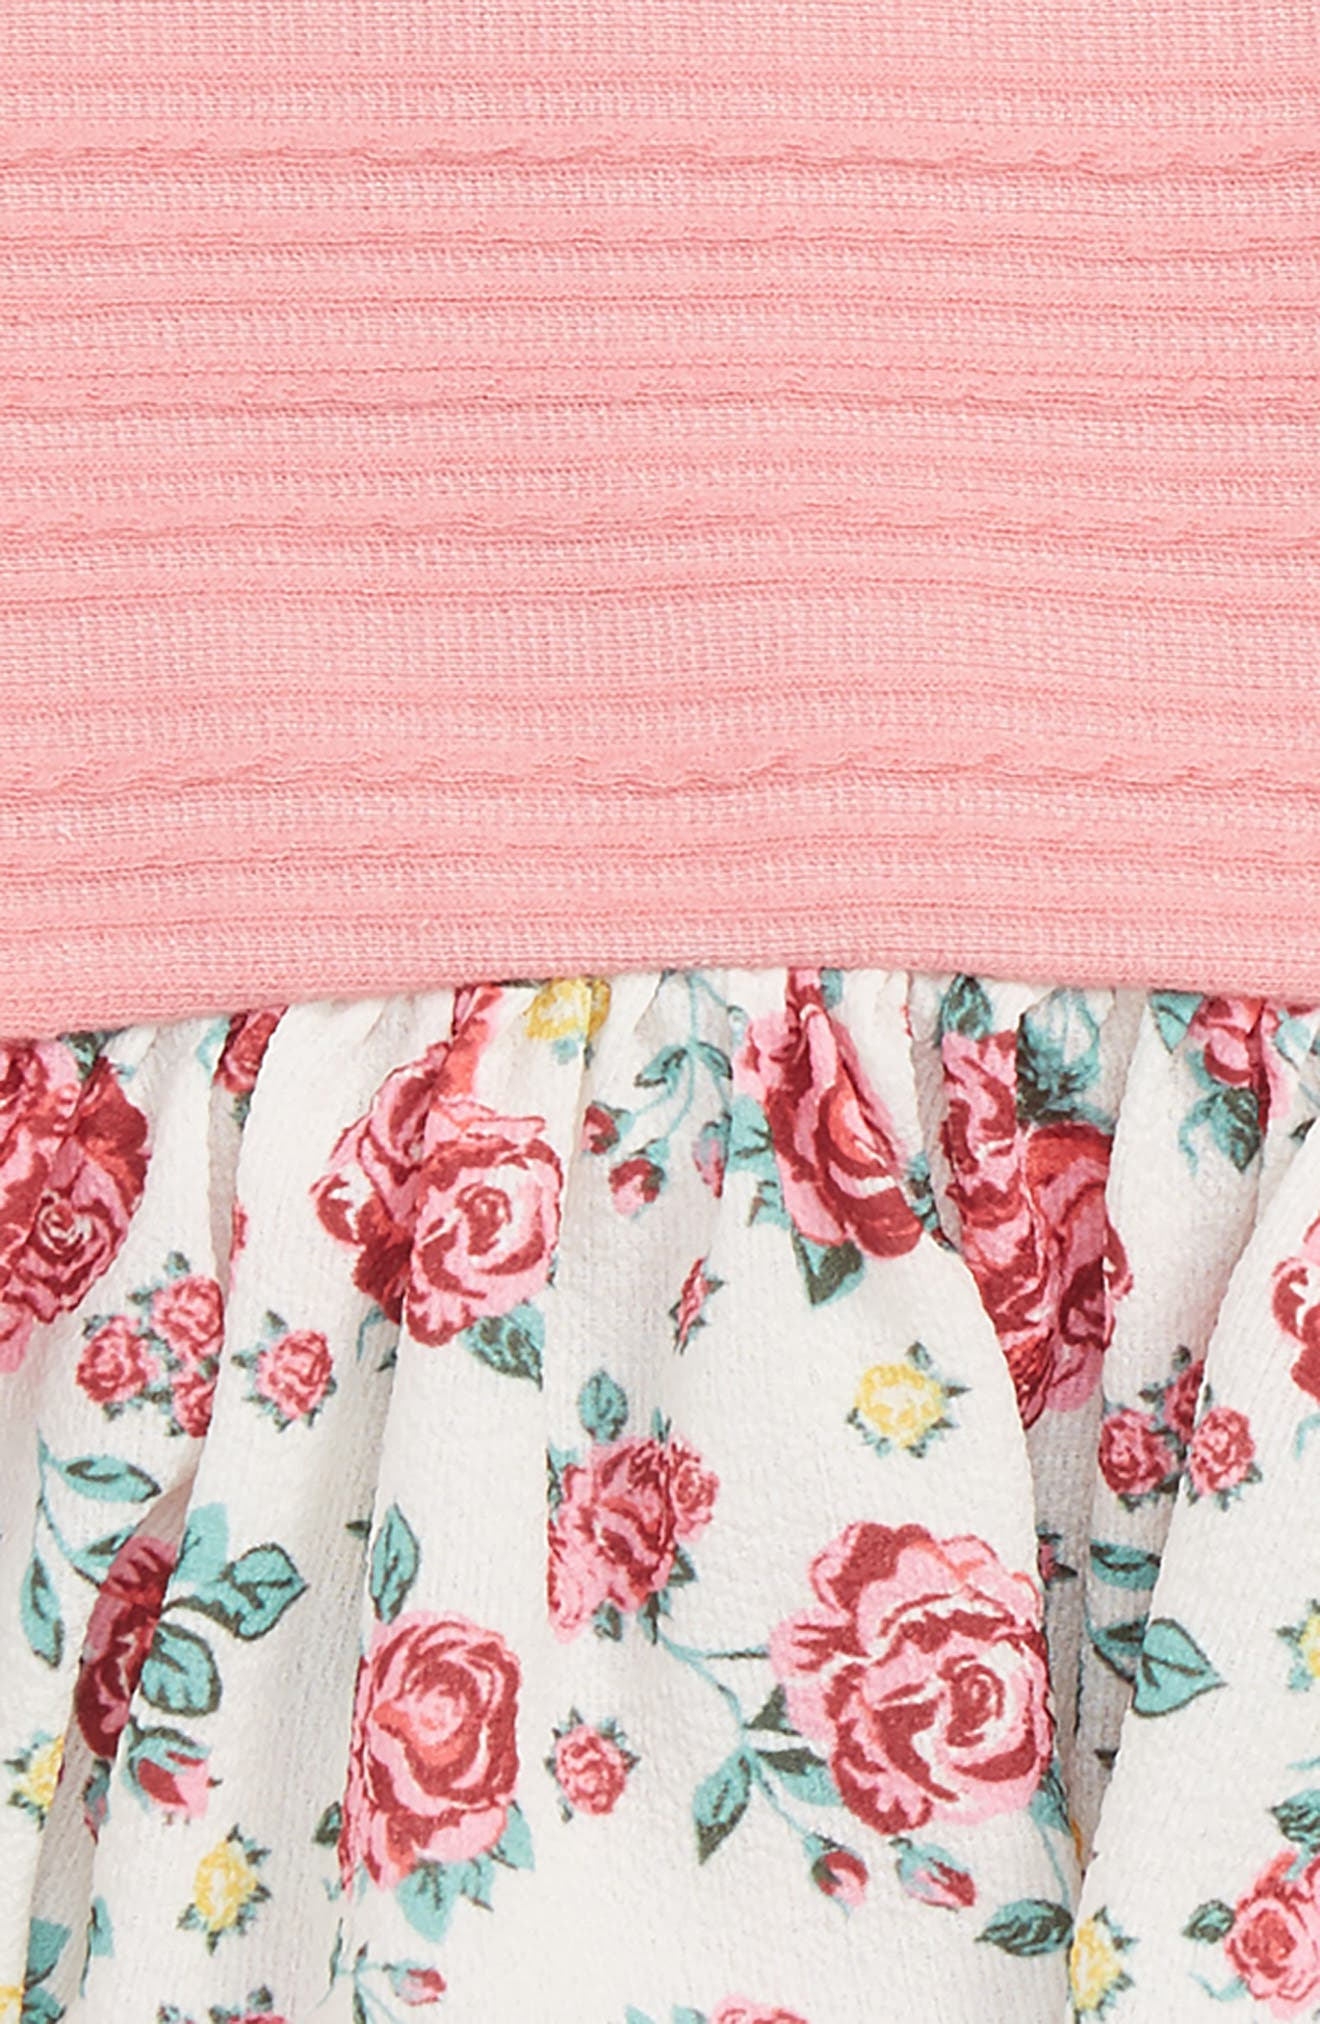 Floral Peplum Dress & Leggings Set,                             Alternate thumbnail 2, color,                             650